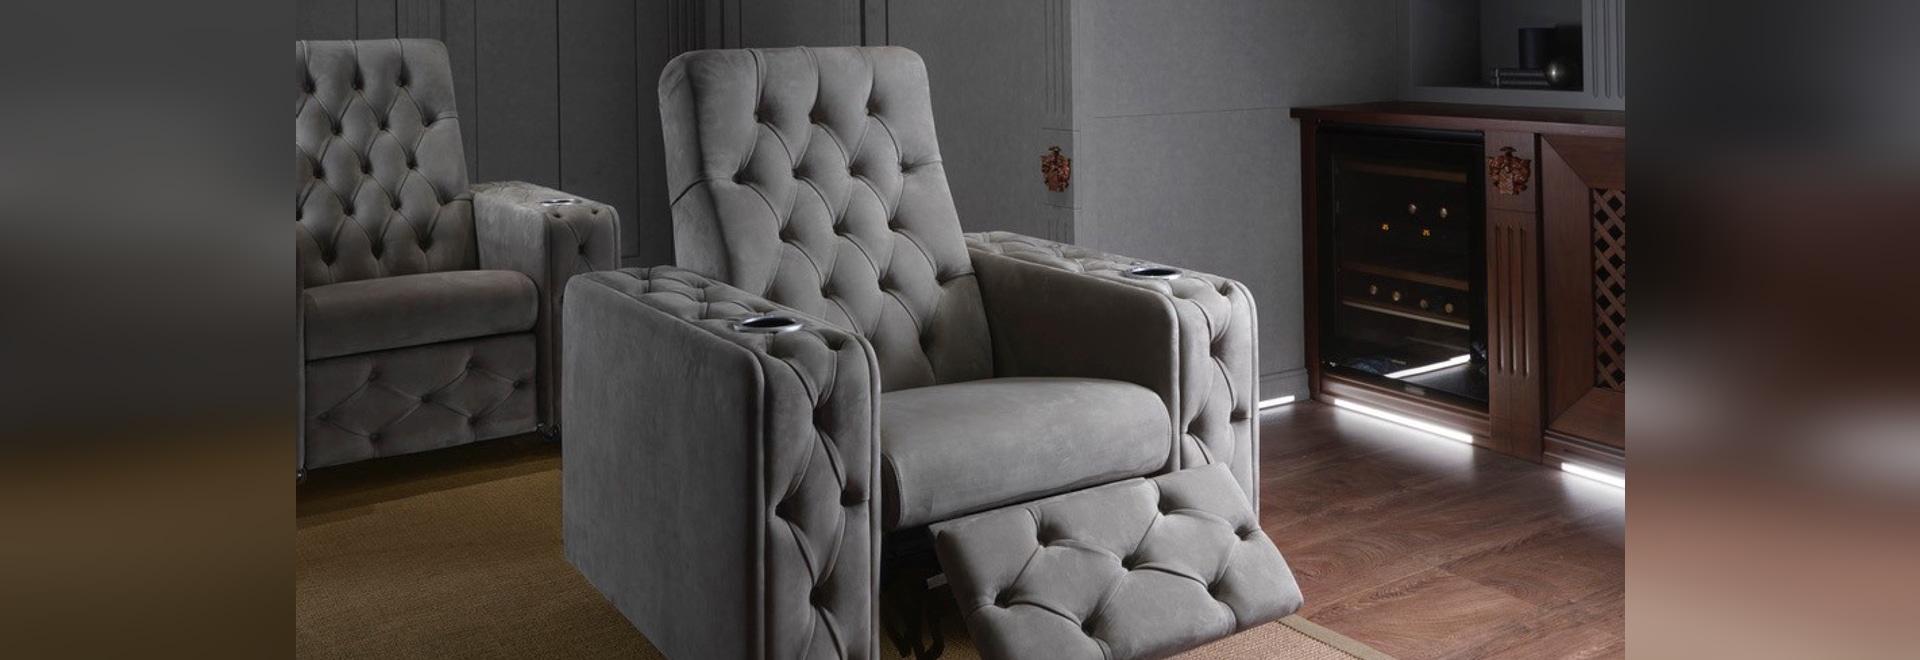 Cinema: reclining motorized armchair